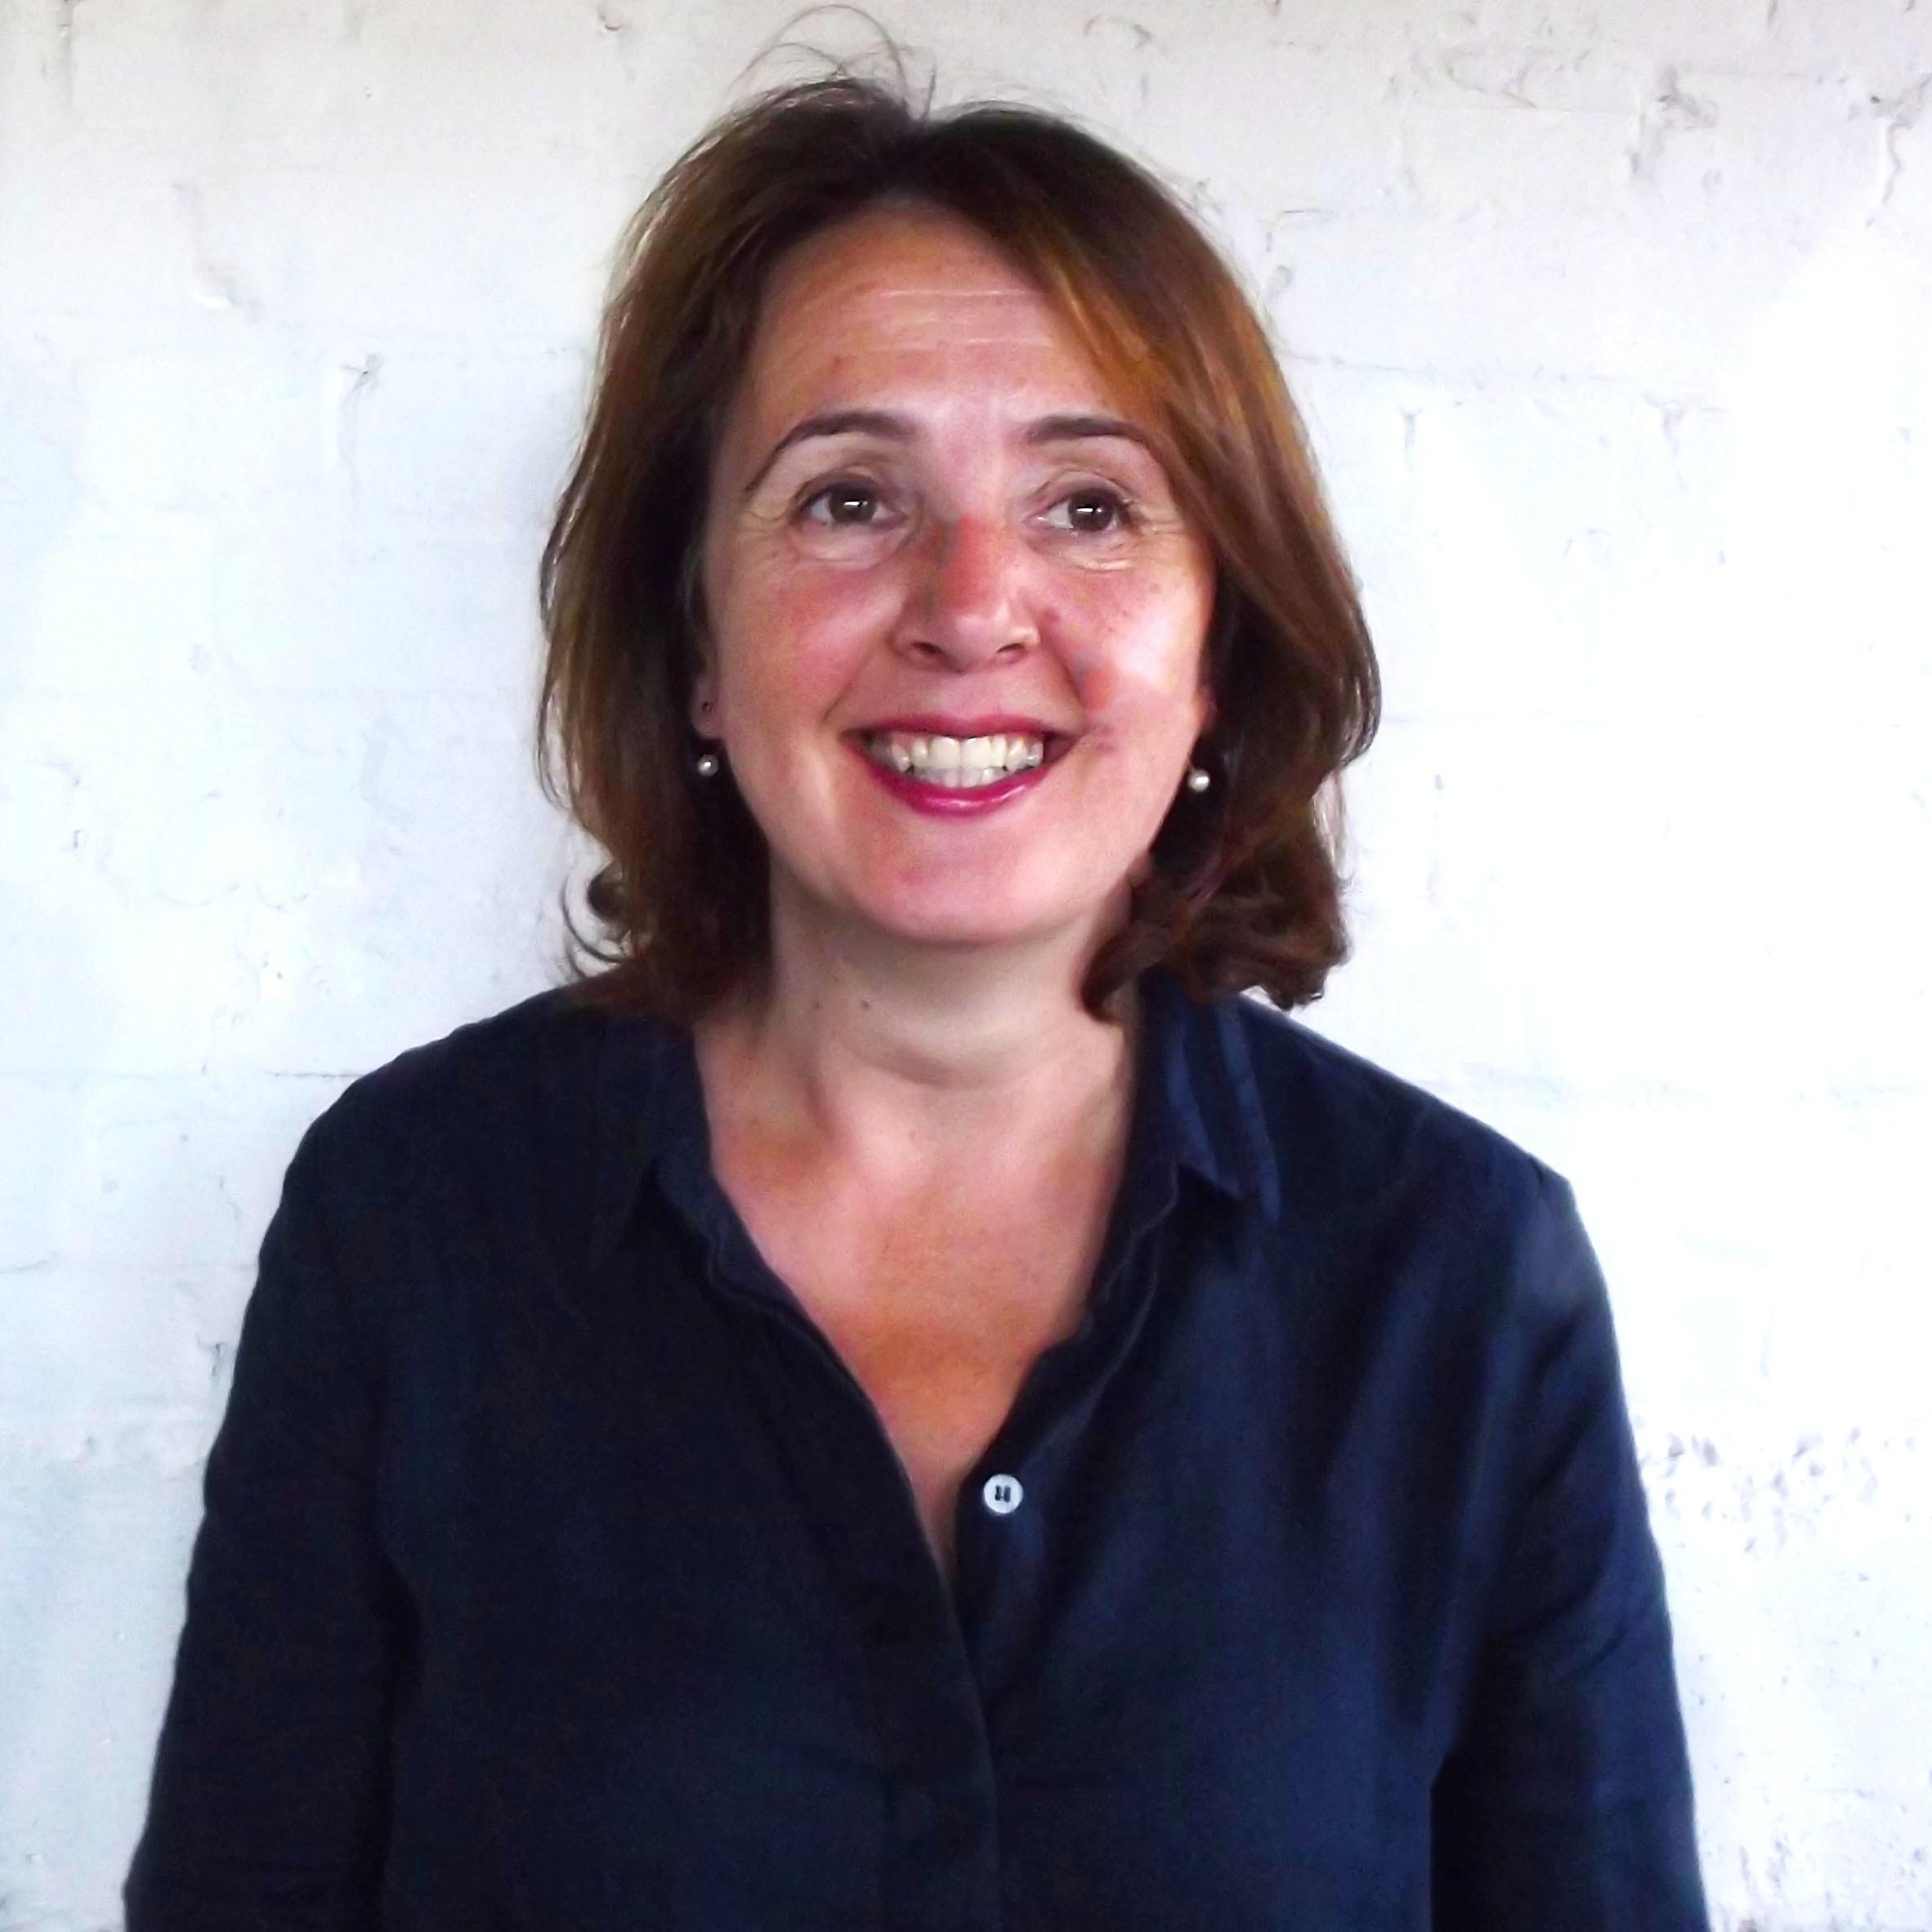 Manuela Boyce